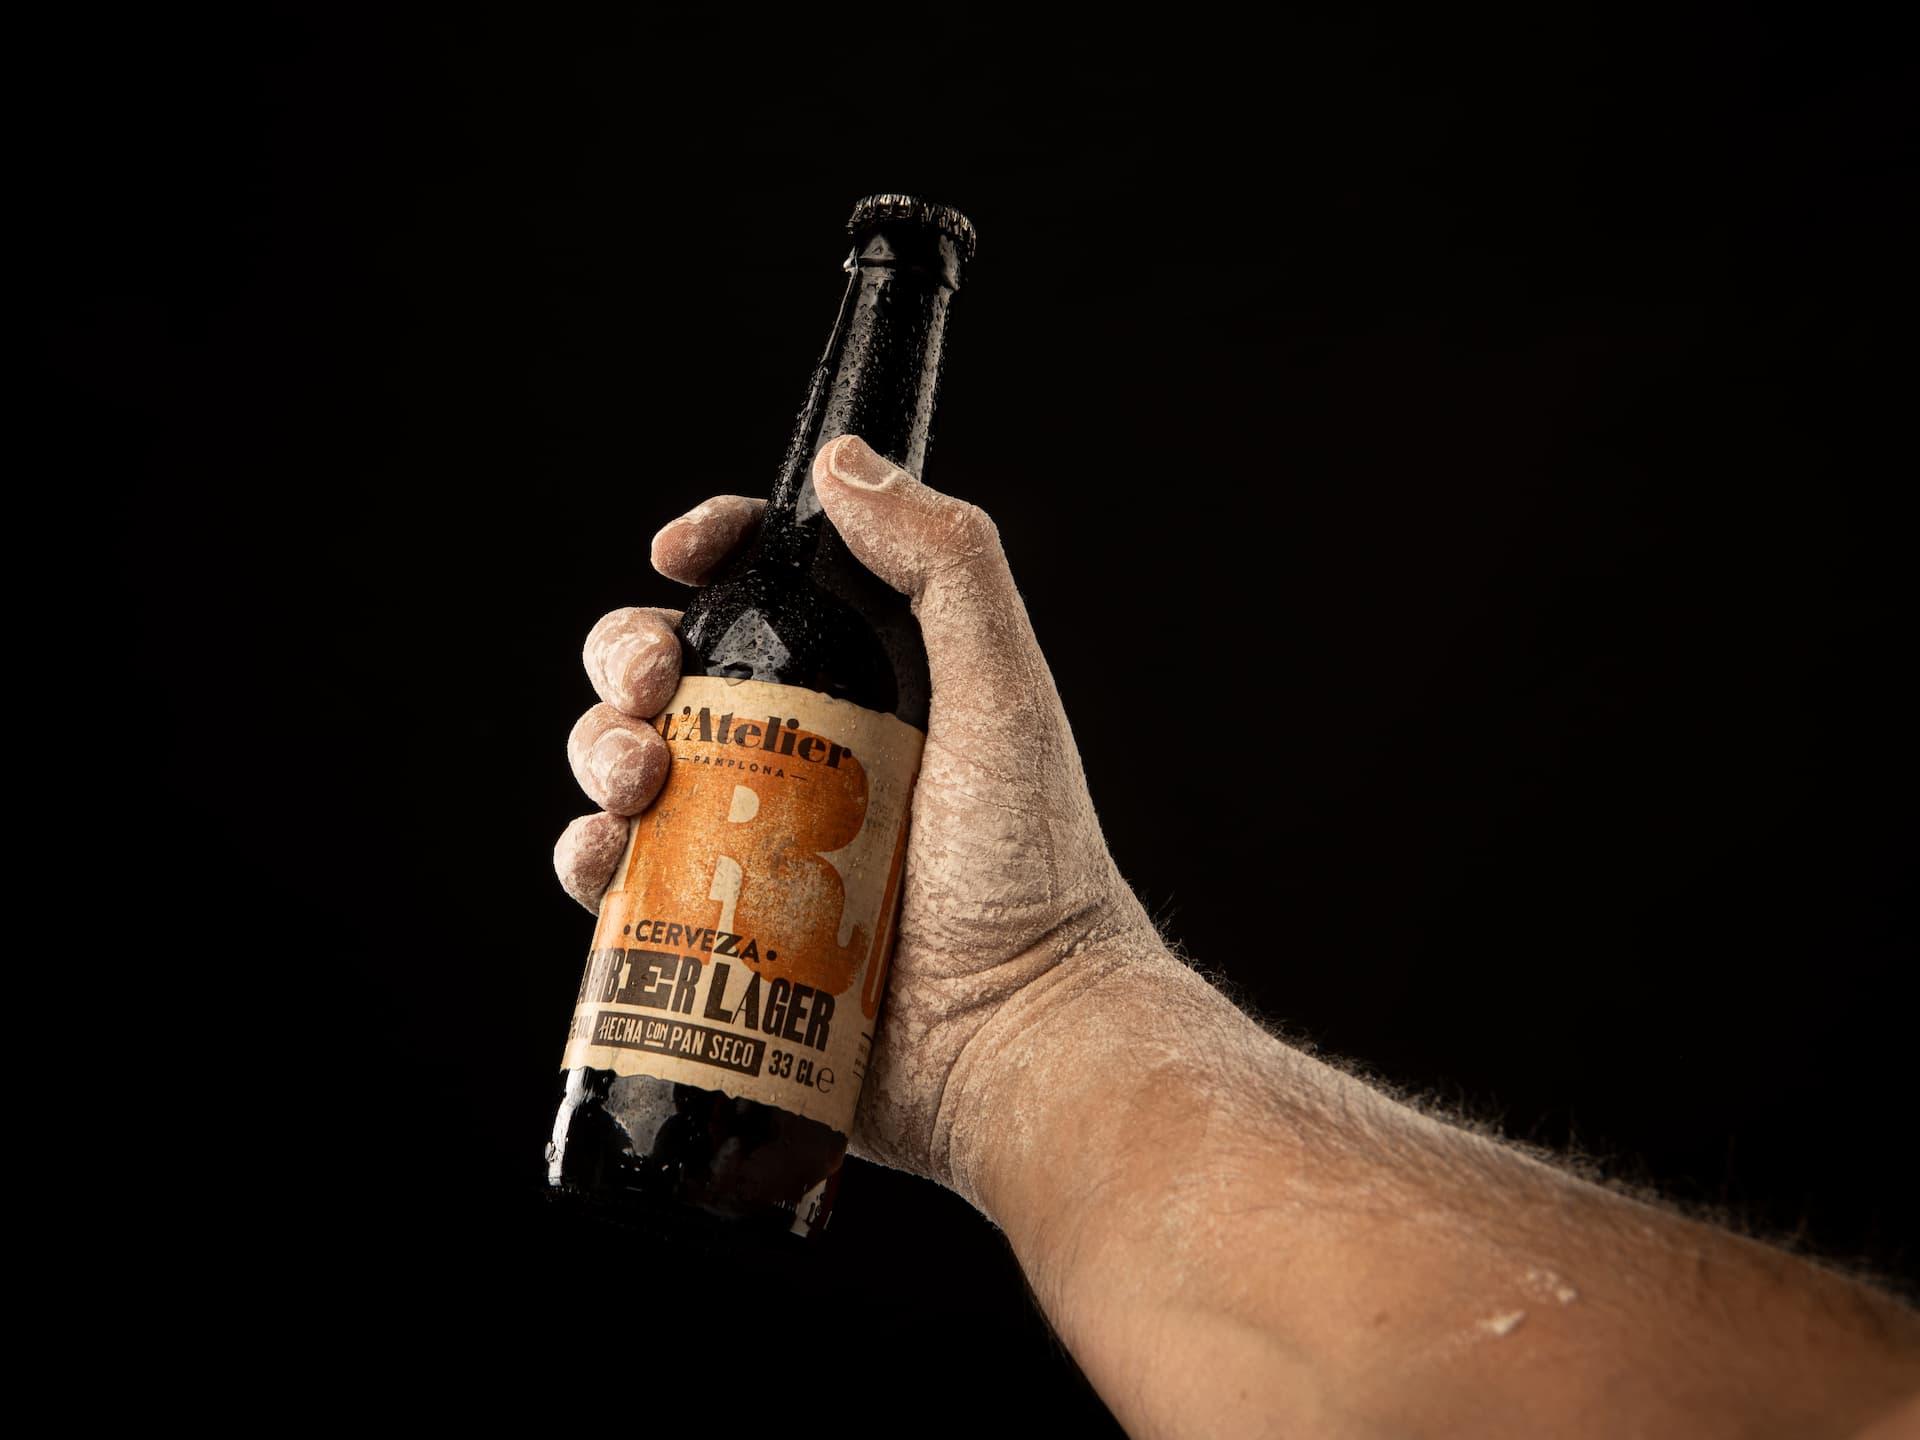 cerveza L'atelier